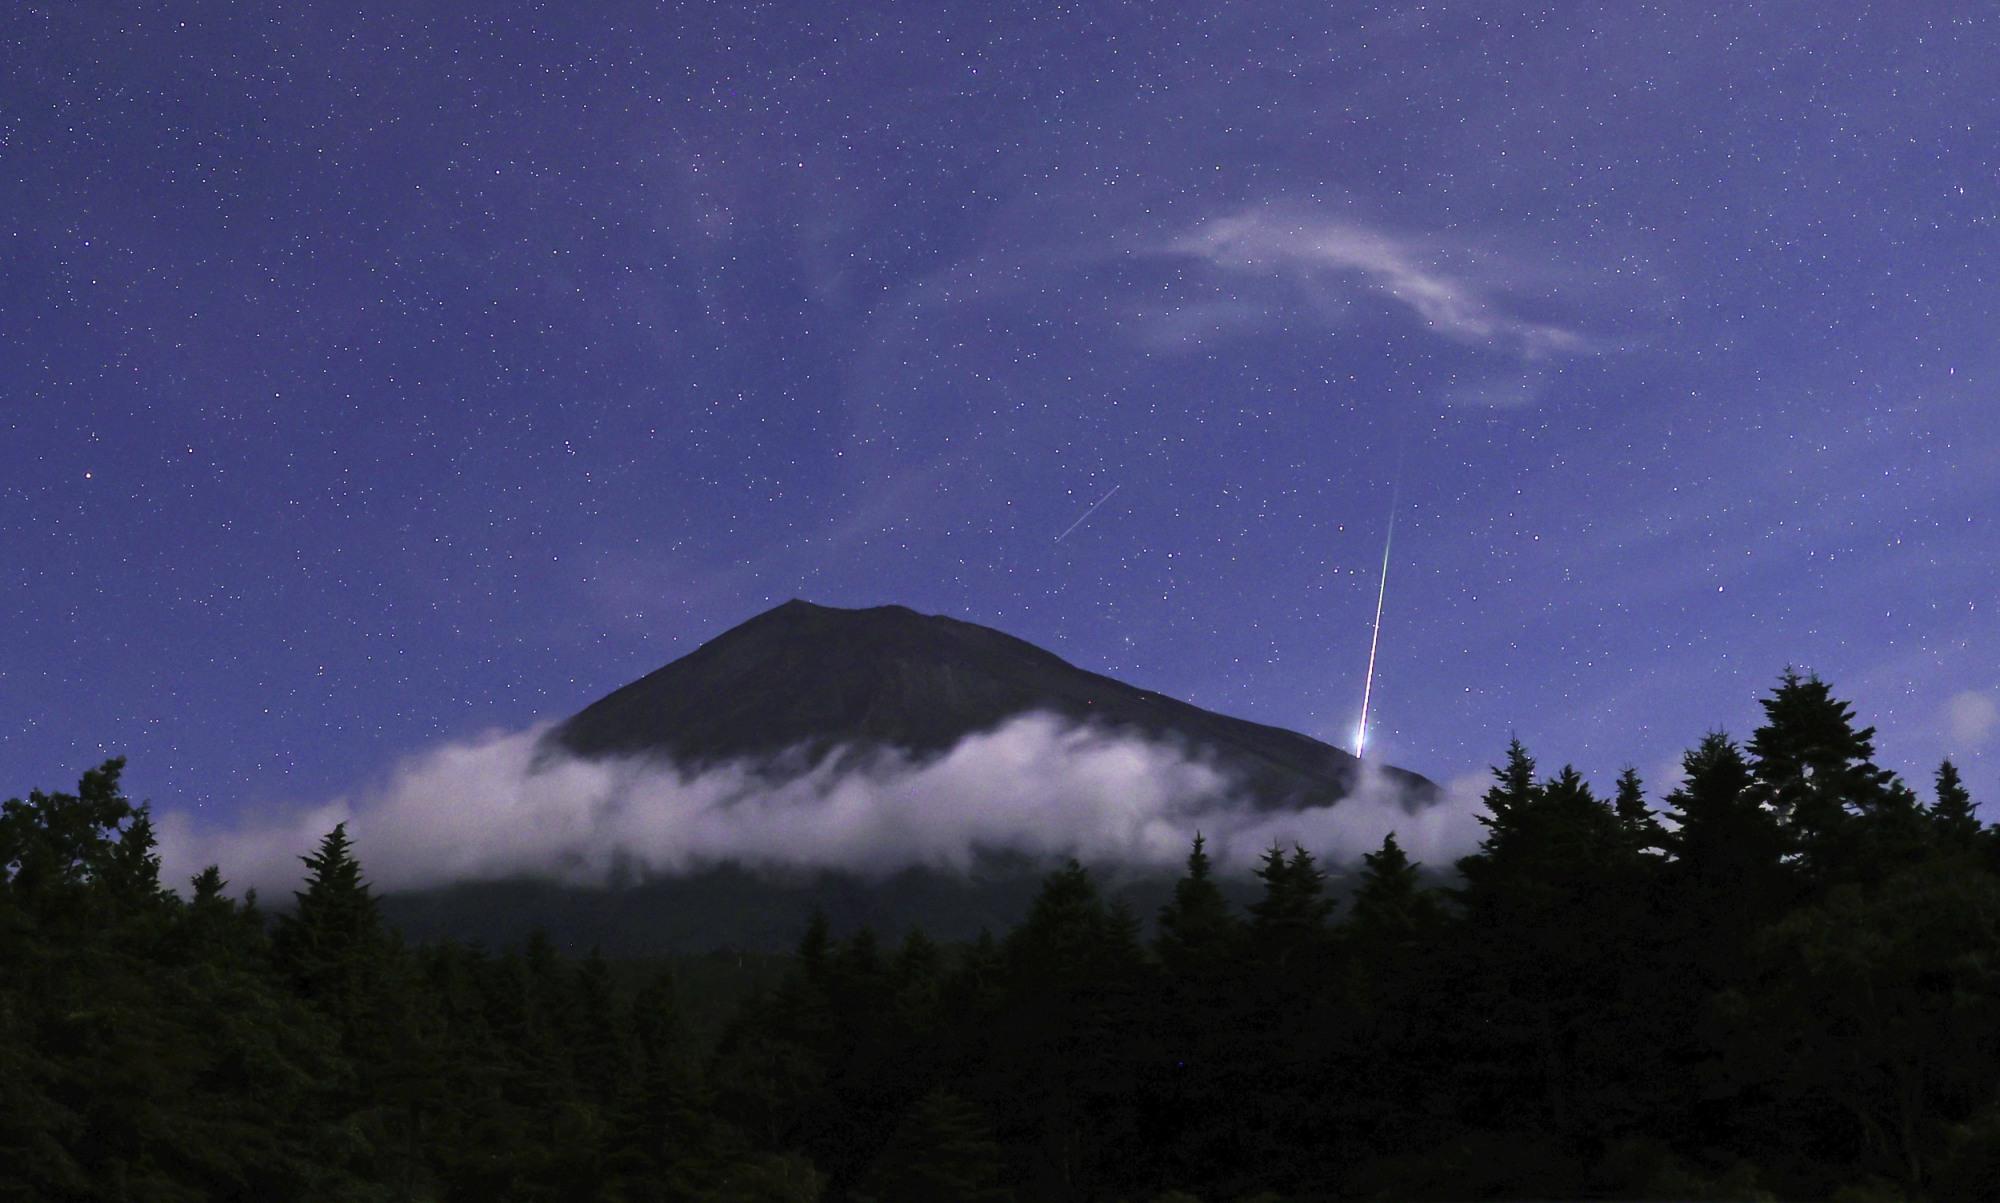 How to Watch 2021's Perseid Meteor Shower